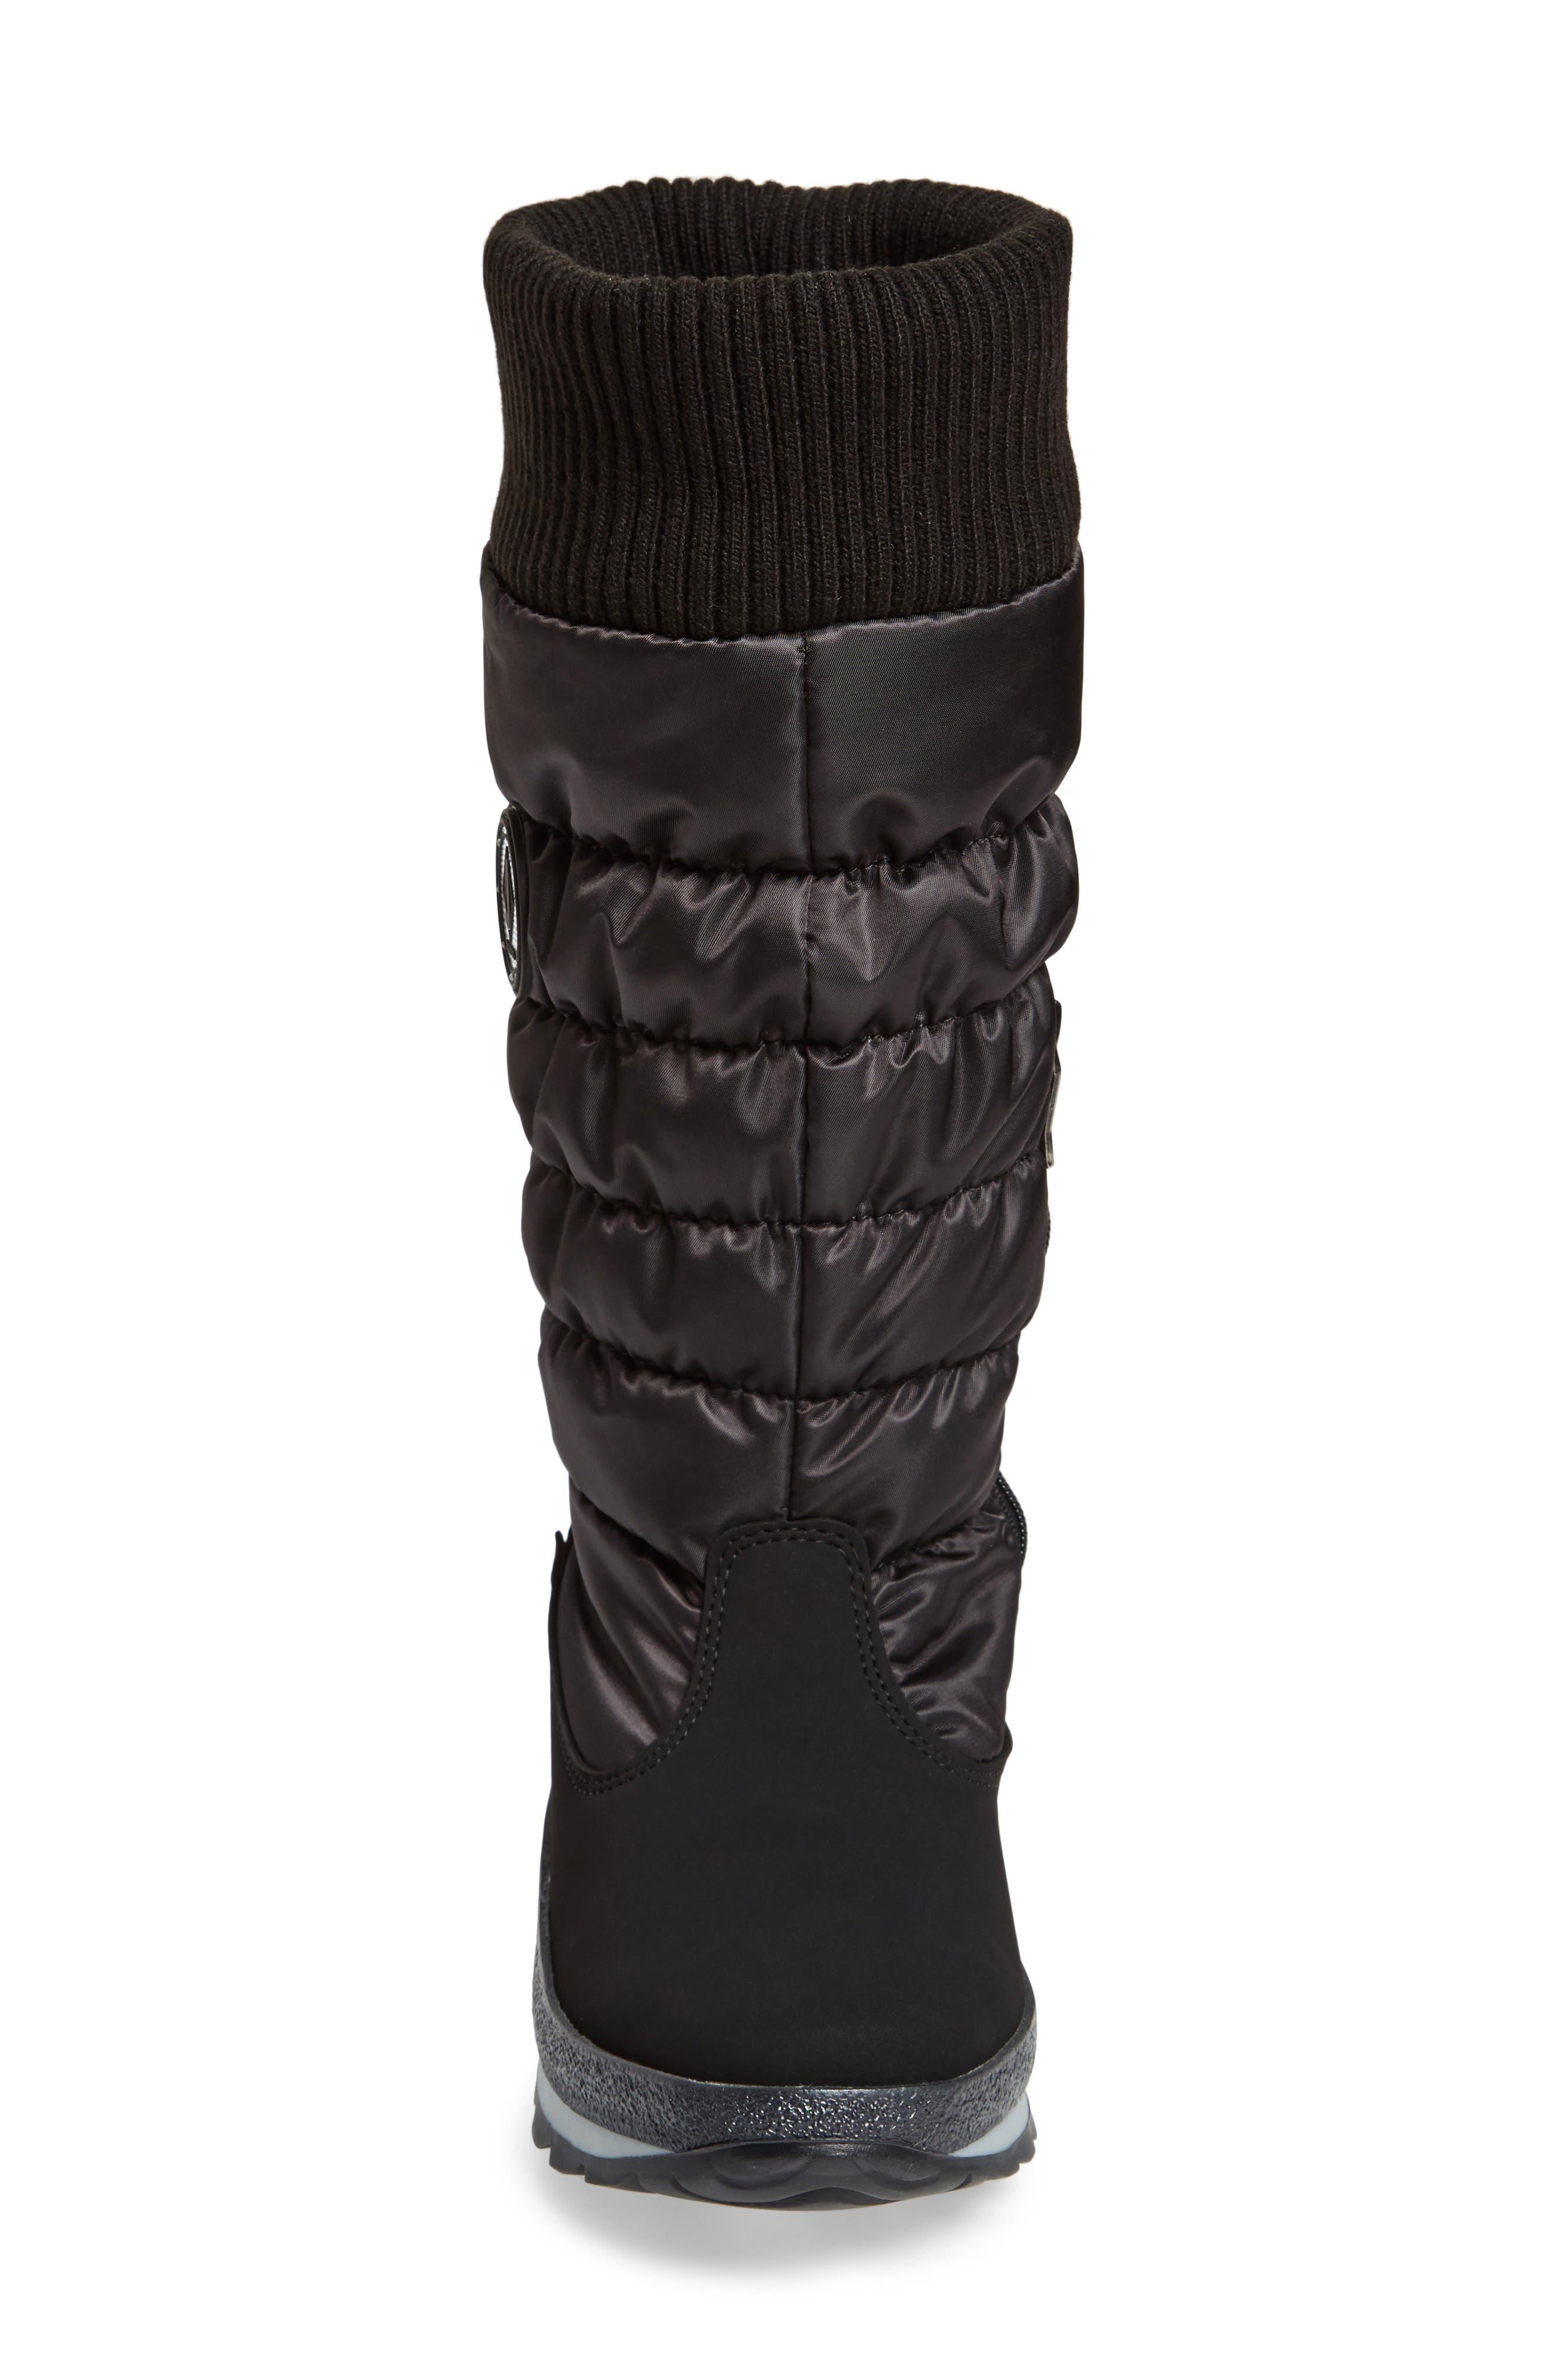 St. Anton Waterproof Winter Boot,                             Alternate thumbnail 4, color,                             BLACK/ ANTHRACITE